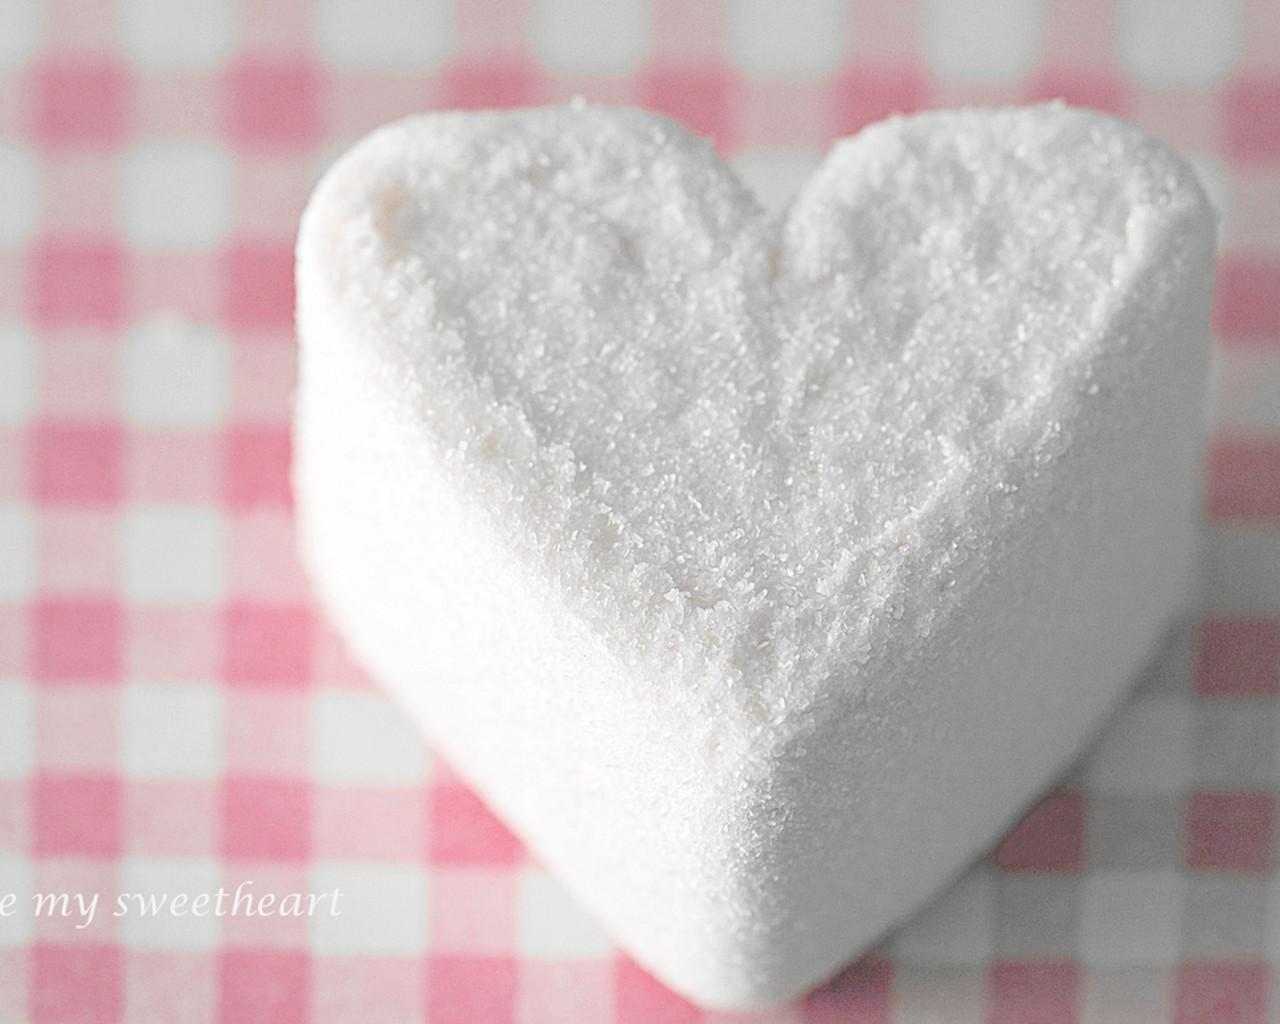 Heart Shaped Marshmallow wallpapers Heart Shaped Marshmallow stock 1280x1024